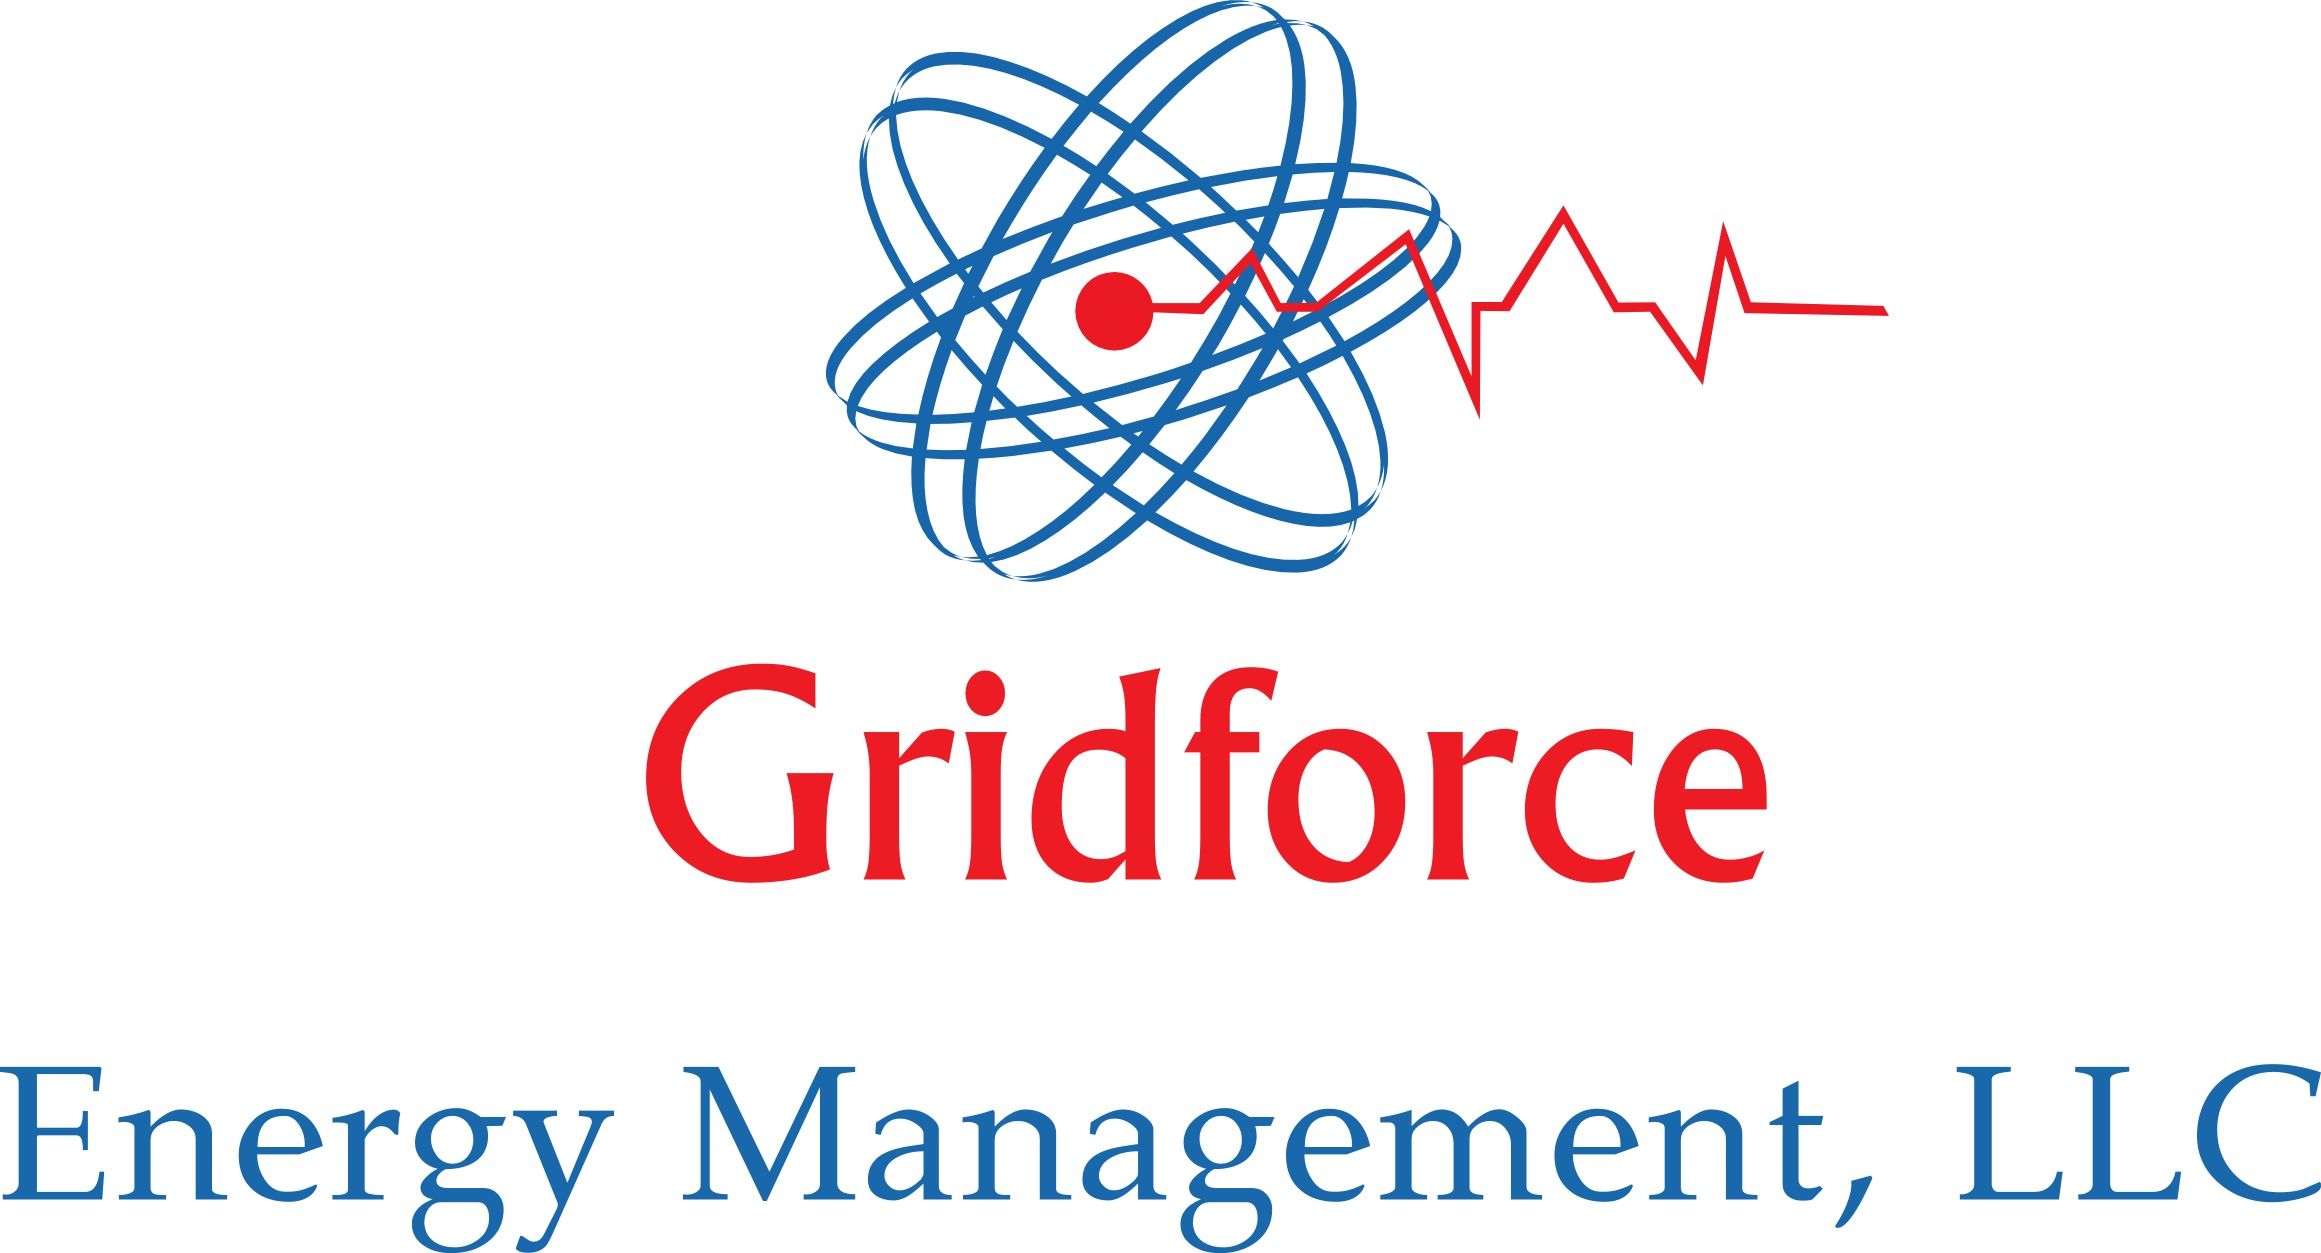 Gridforce Energy Management logo